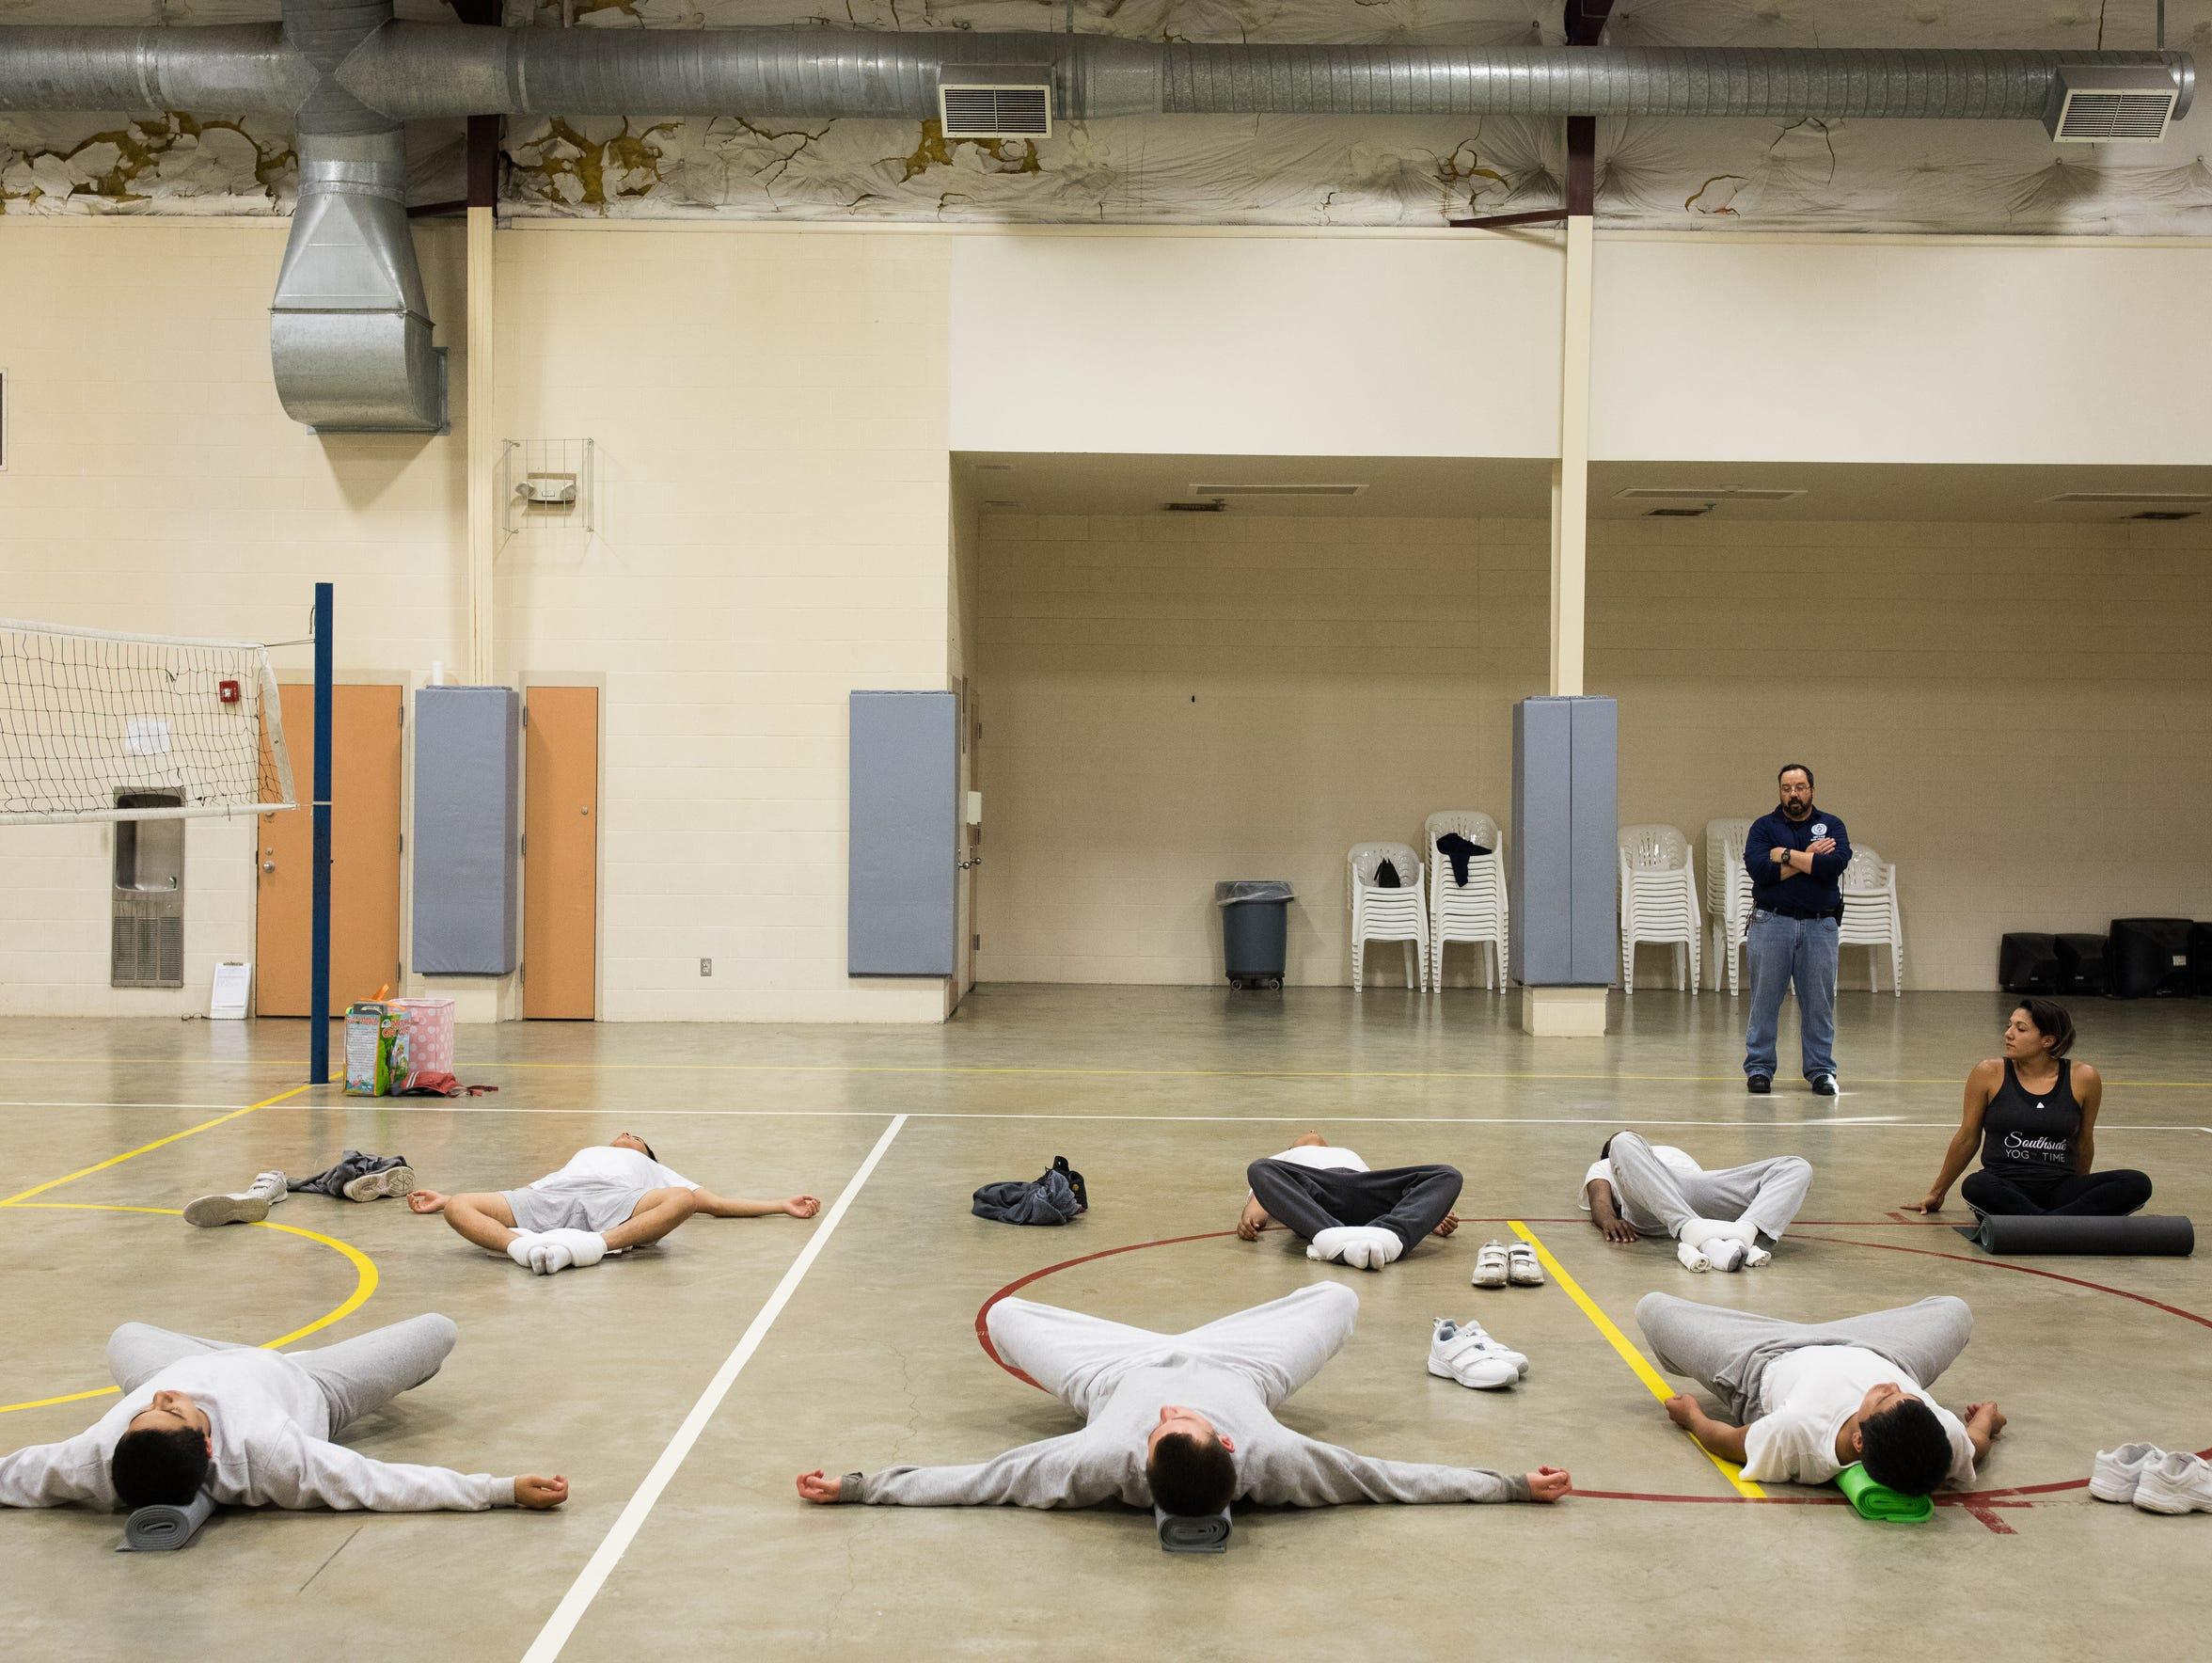 Yoga teacher Ashley Chapa leads a group of juveniles